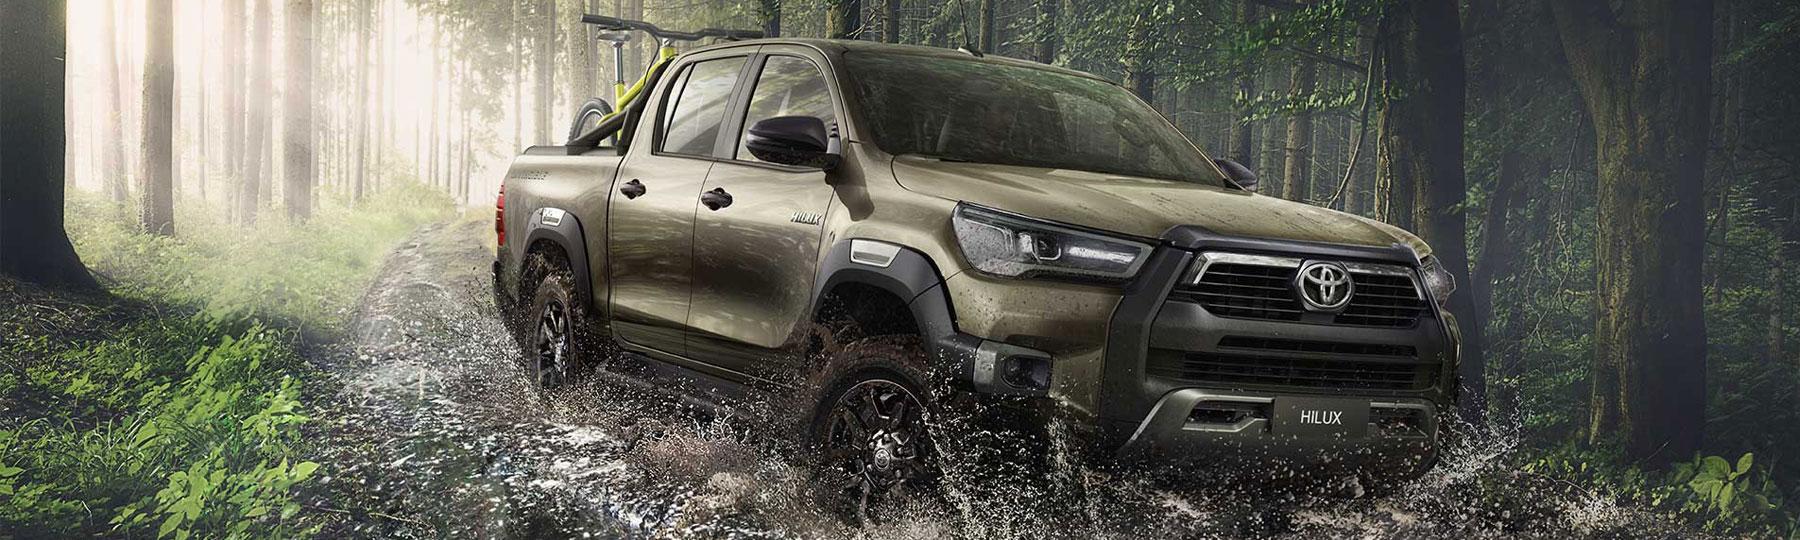 Toyota Hilux New Van Offer